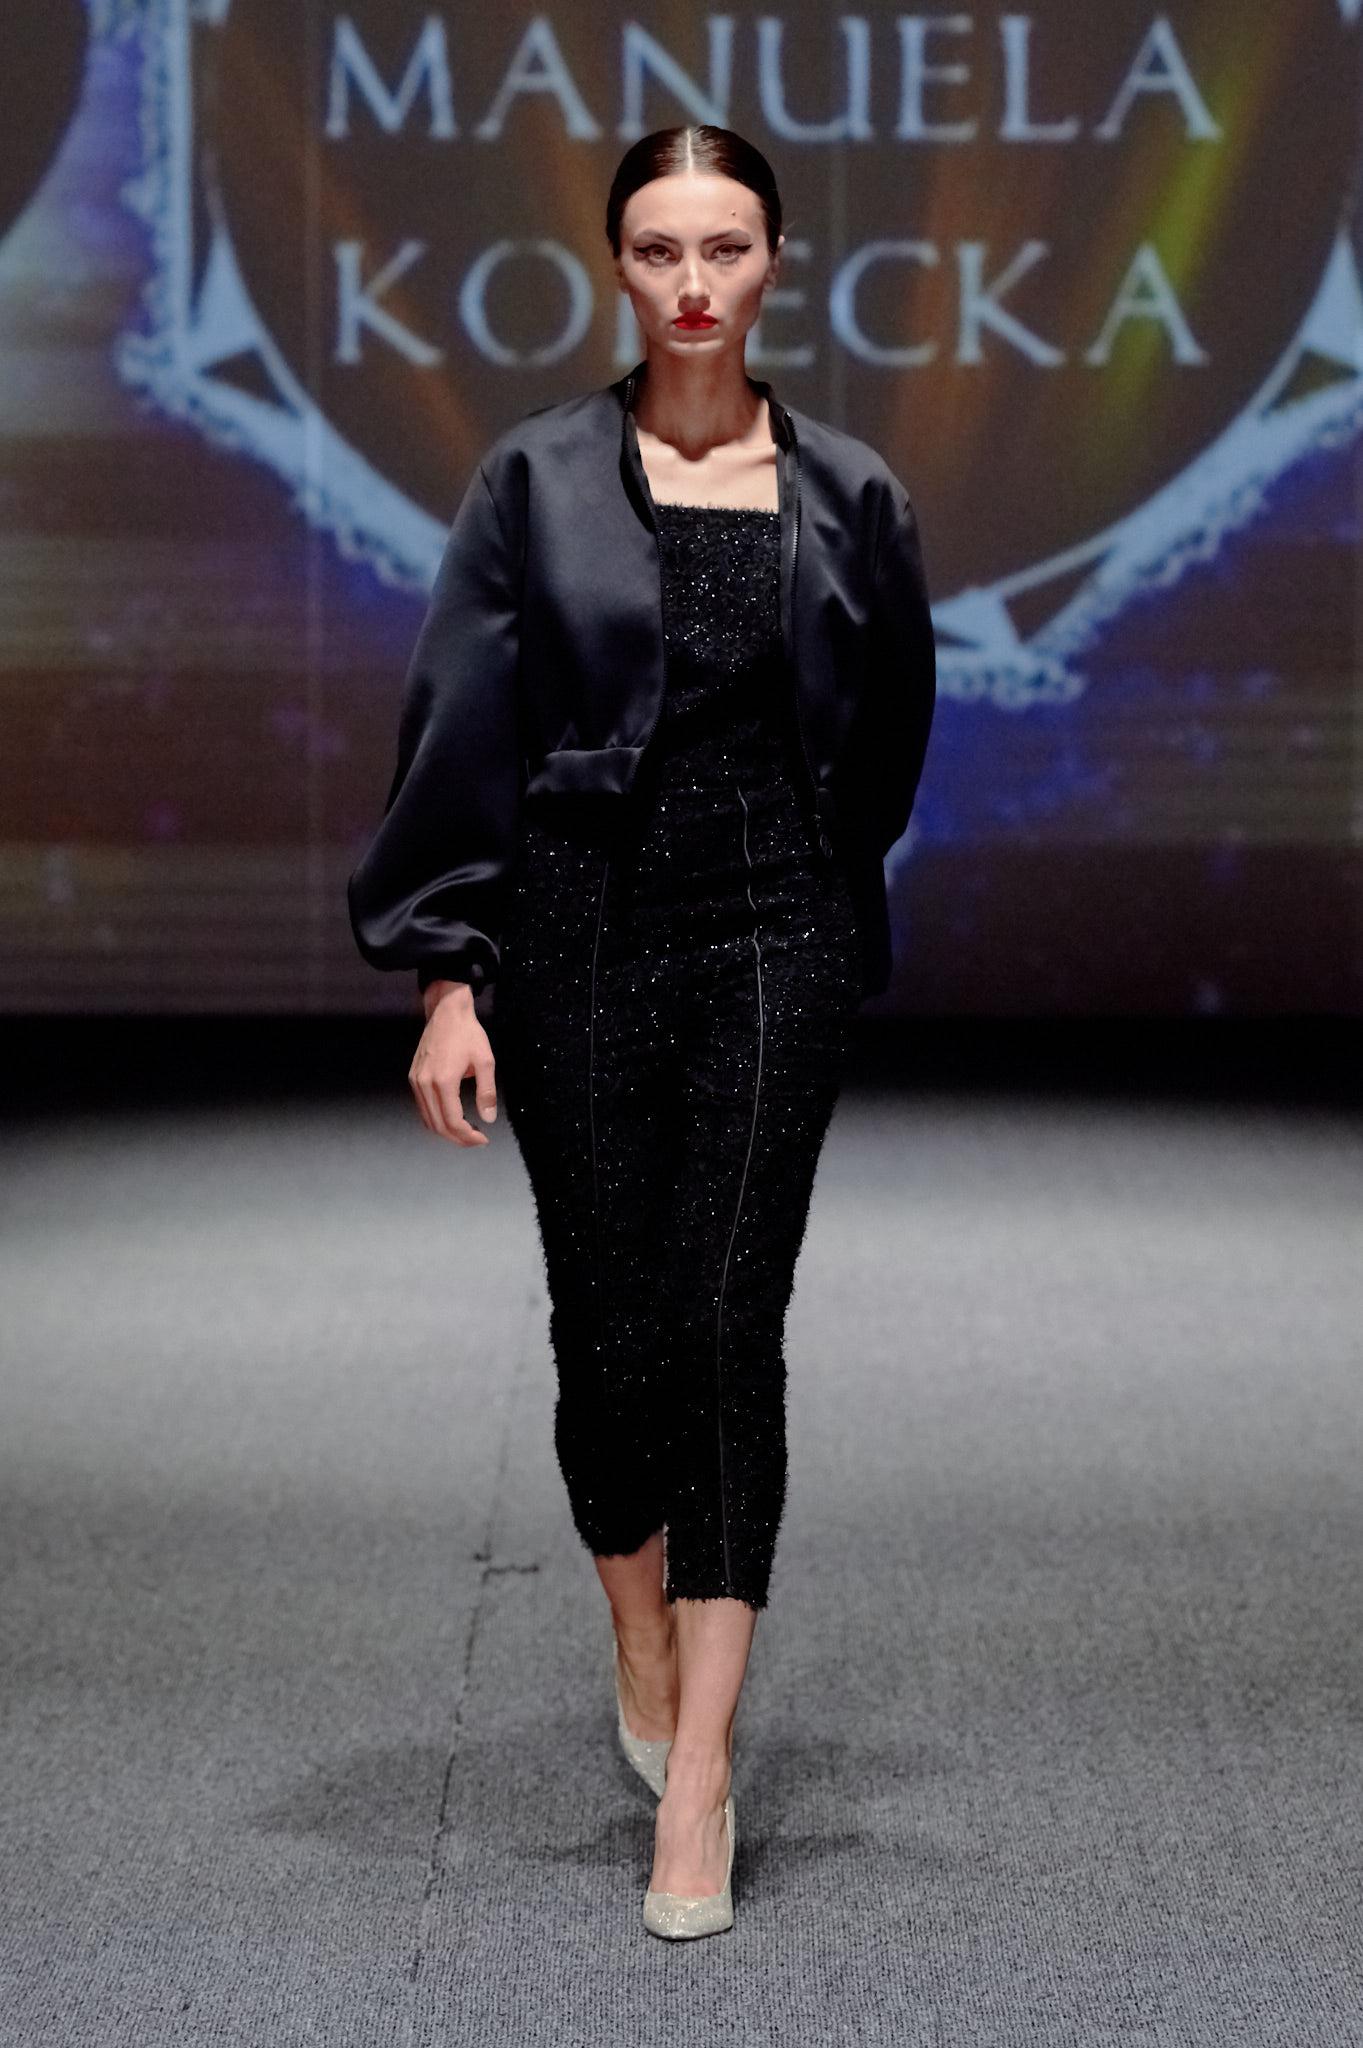 Kolekcja Manueli Koreckiej /fot. Filip Okopny - Fashion Images